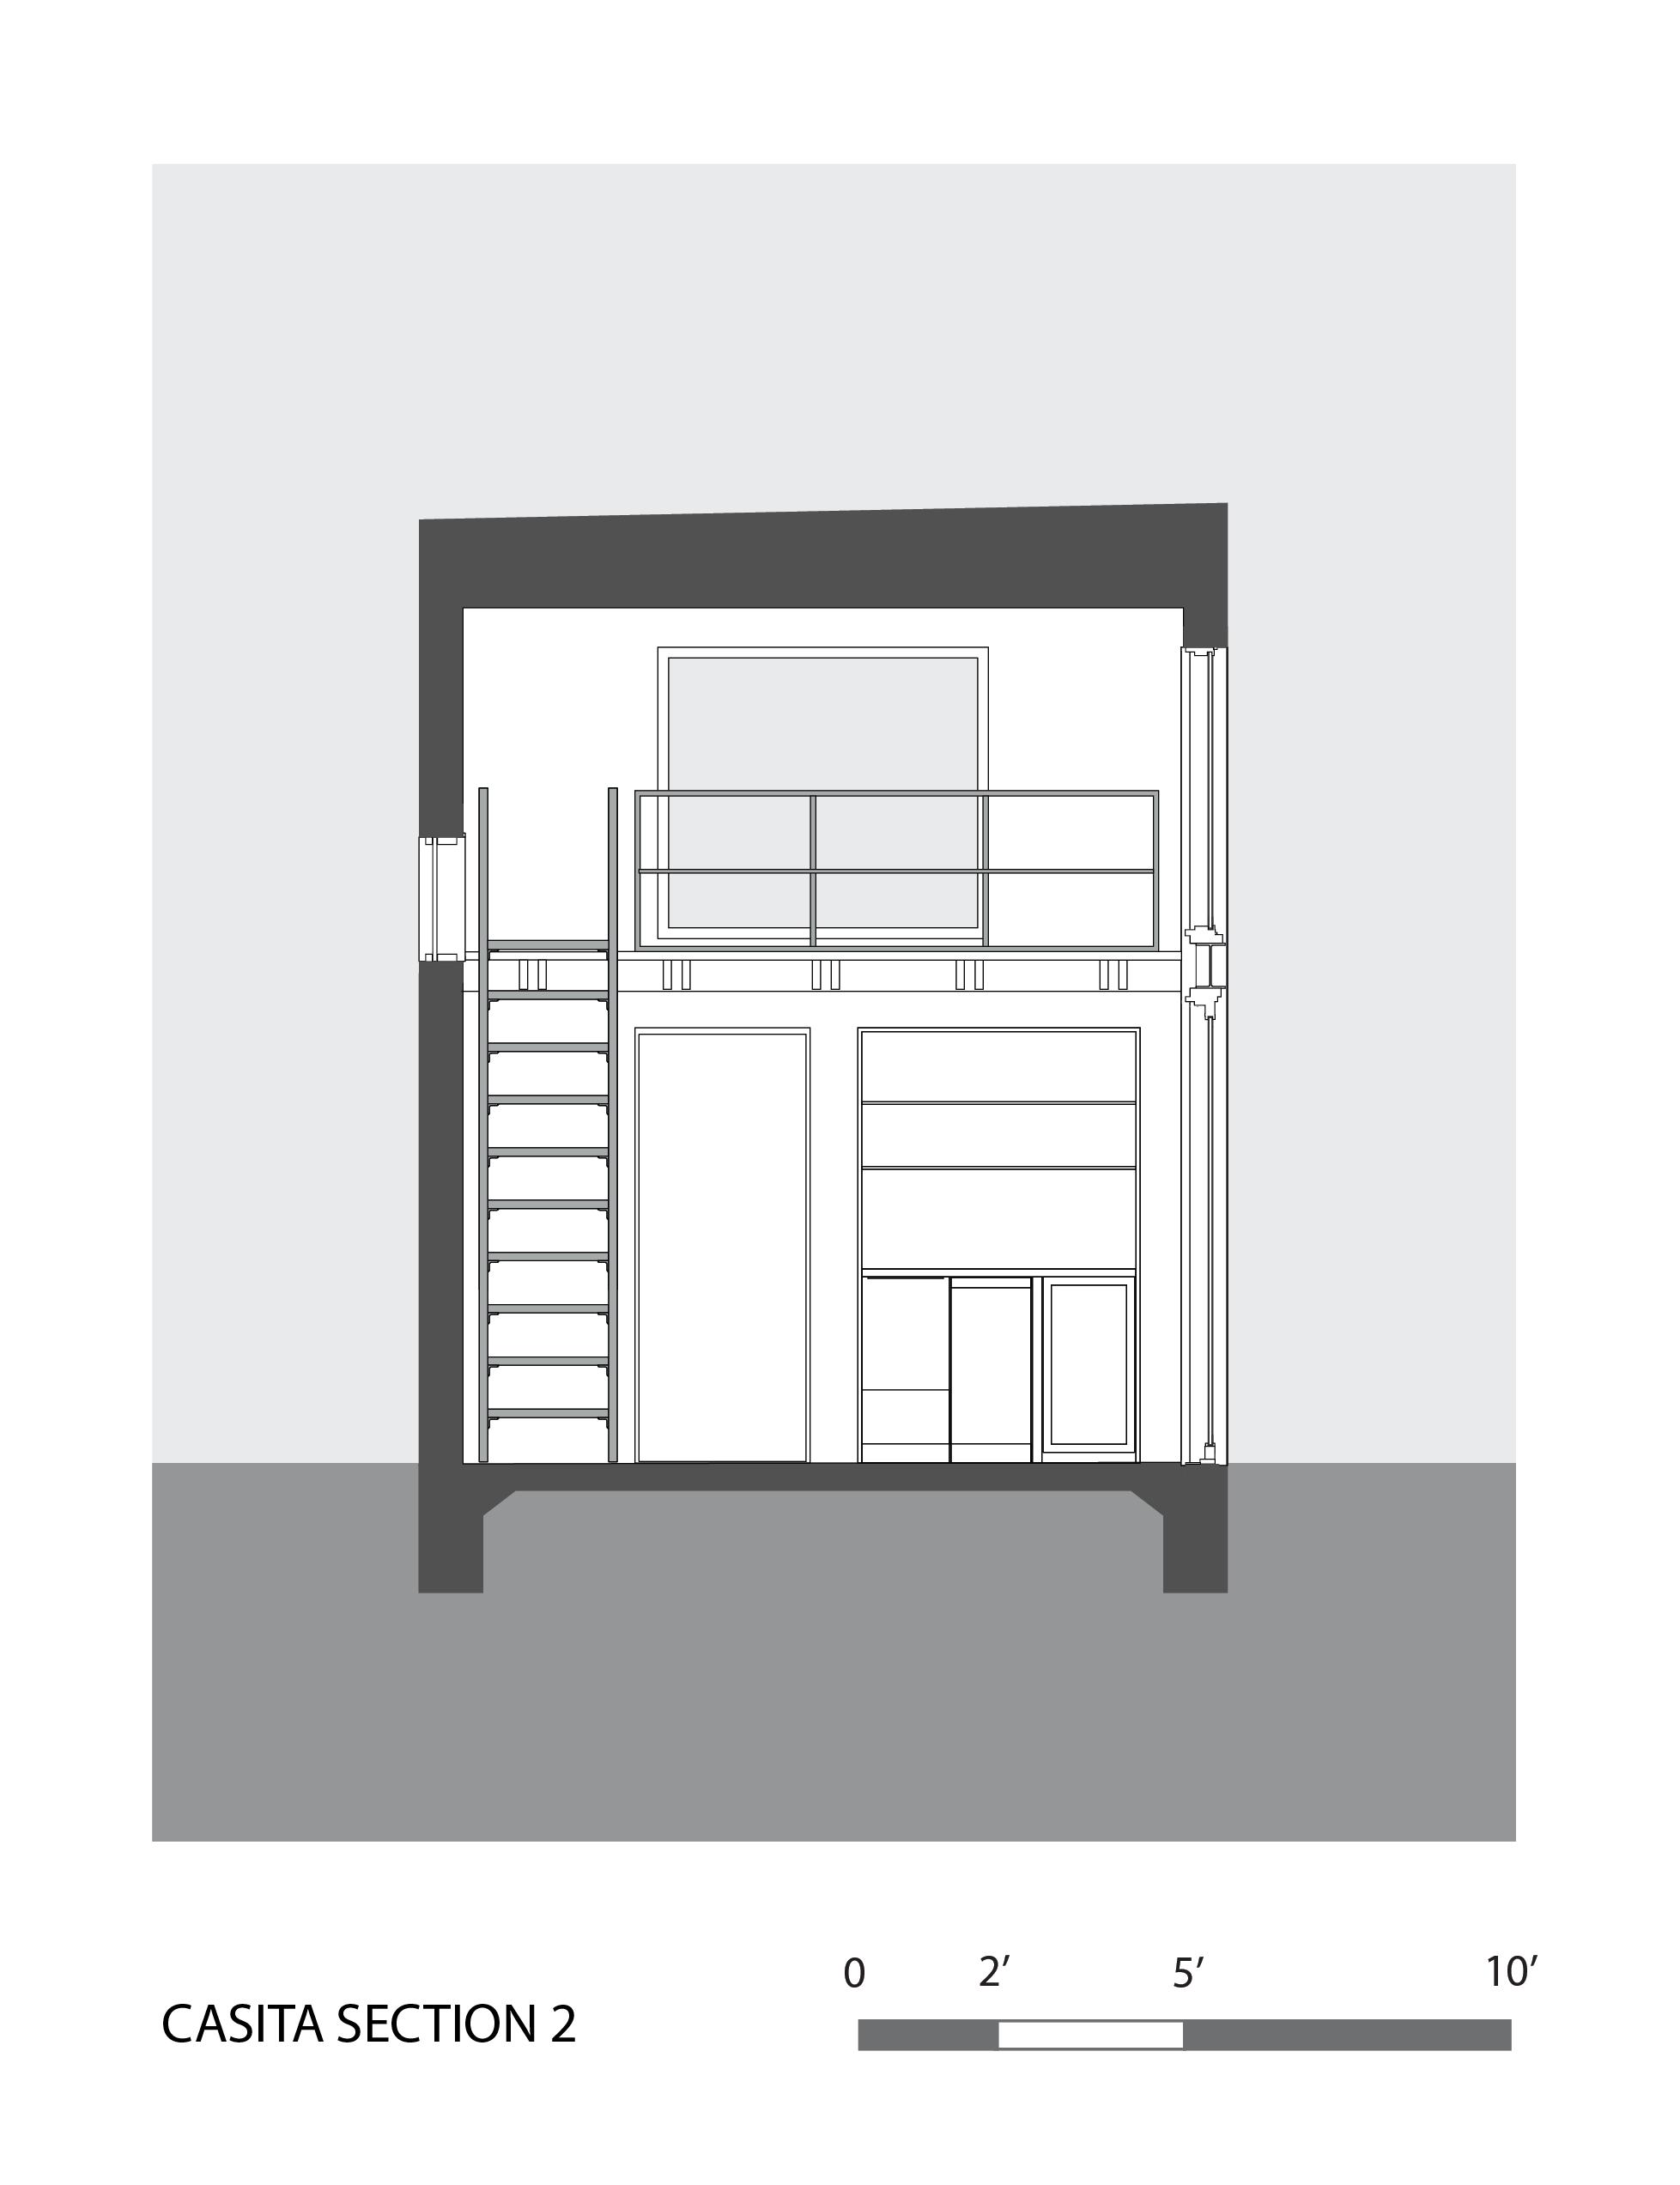 casitaformatsection1-823.png